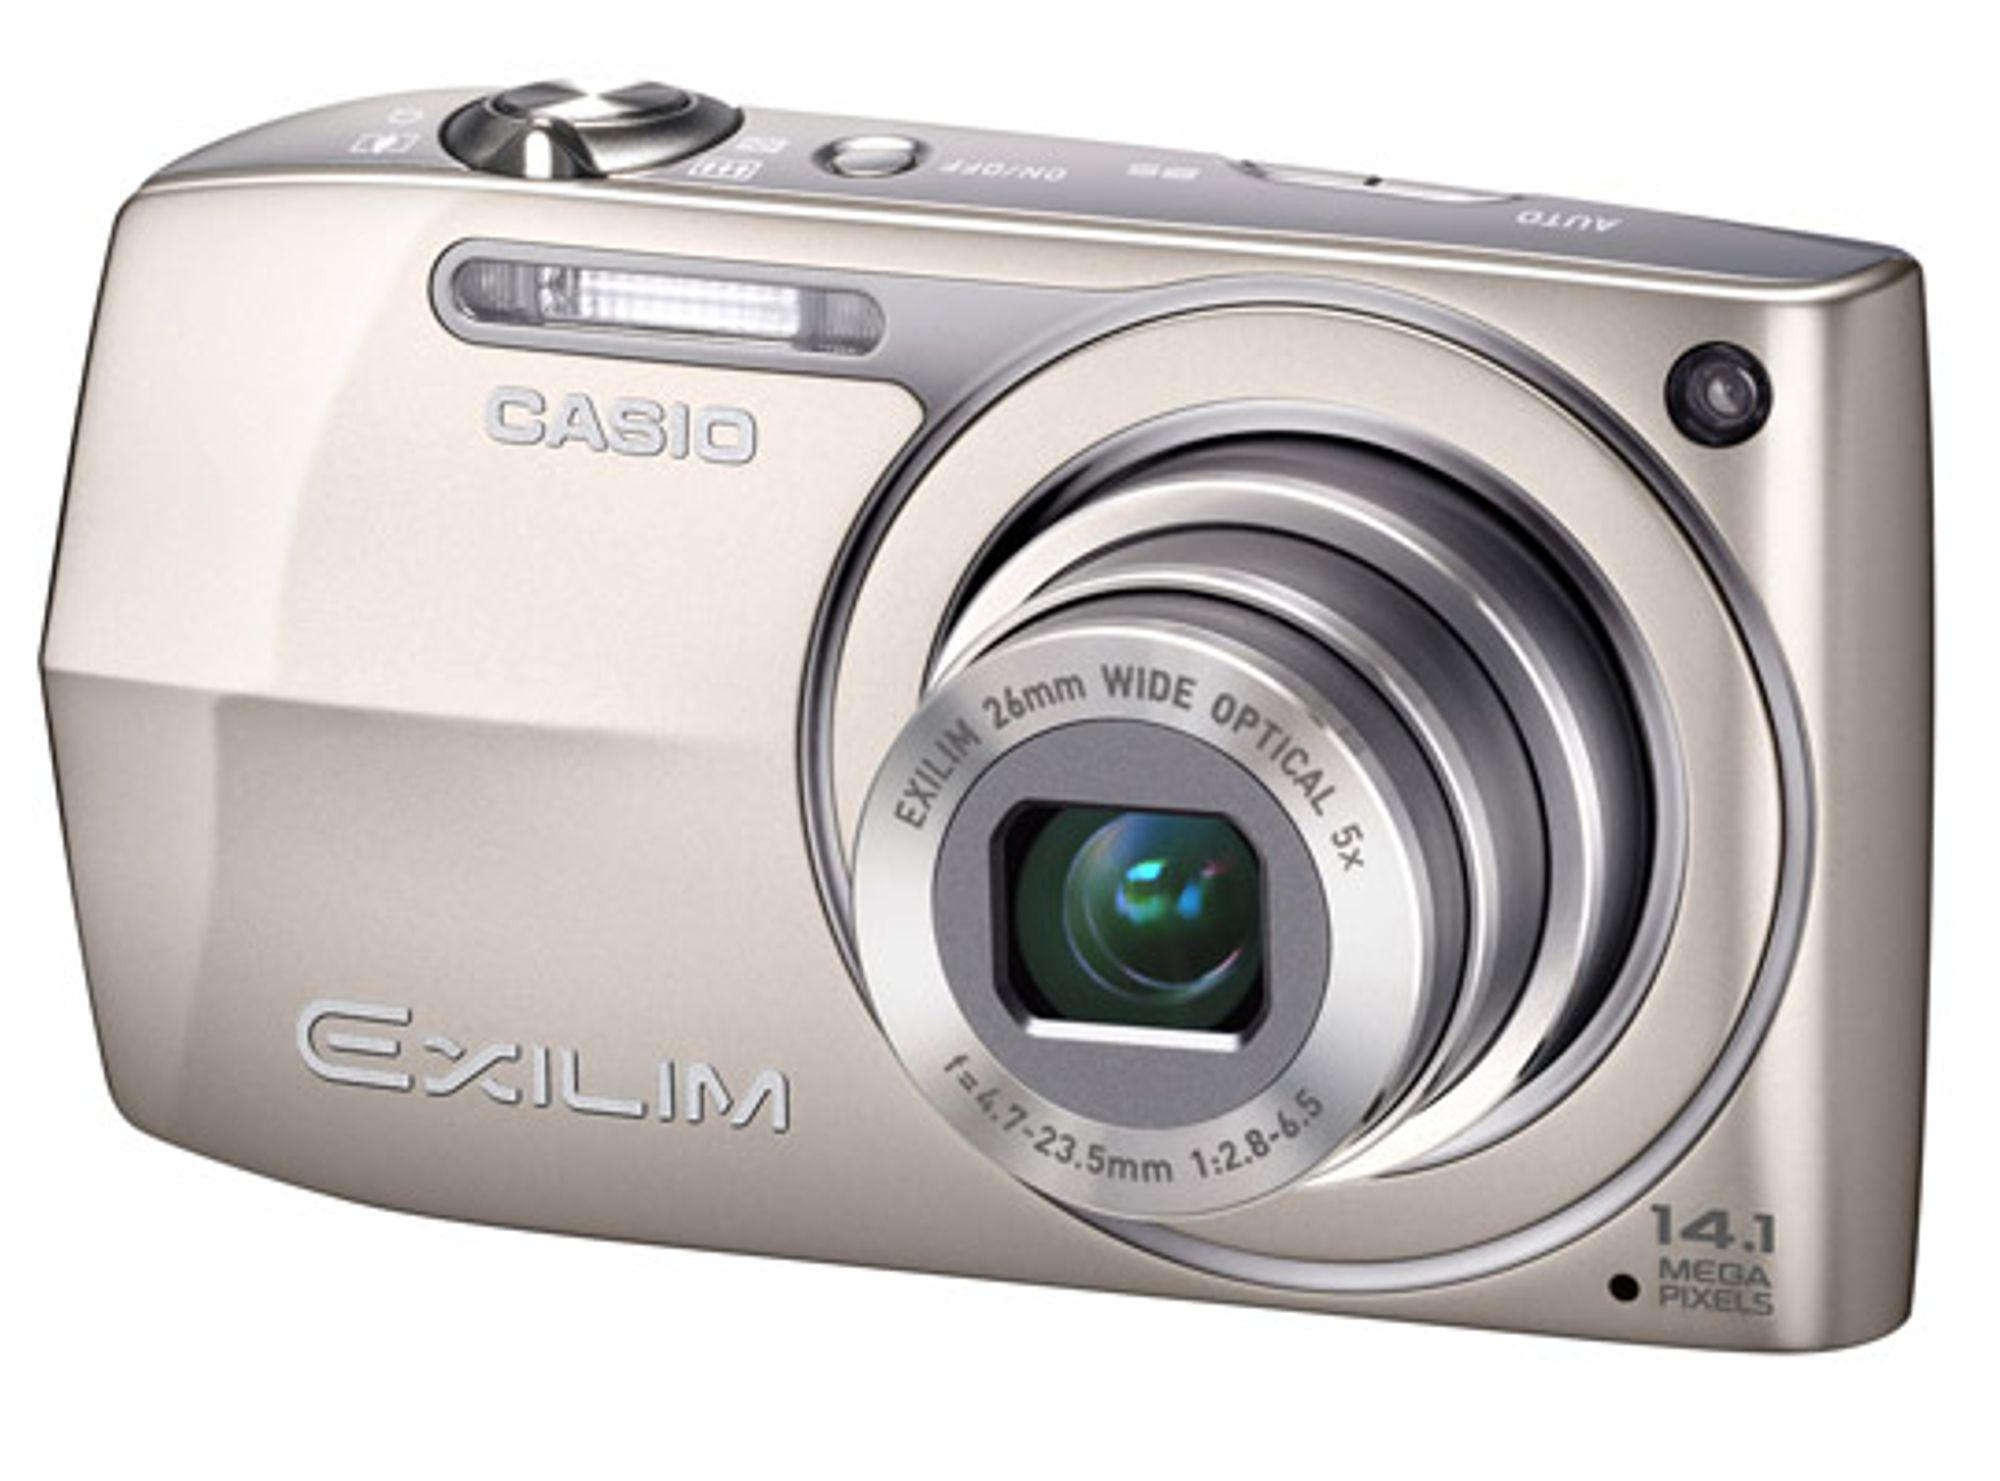 Casio Exilim EX-Z2300. FOTO: Produsenten.